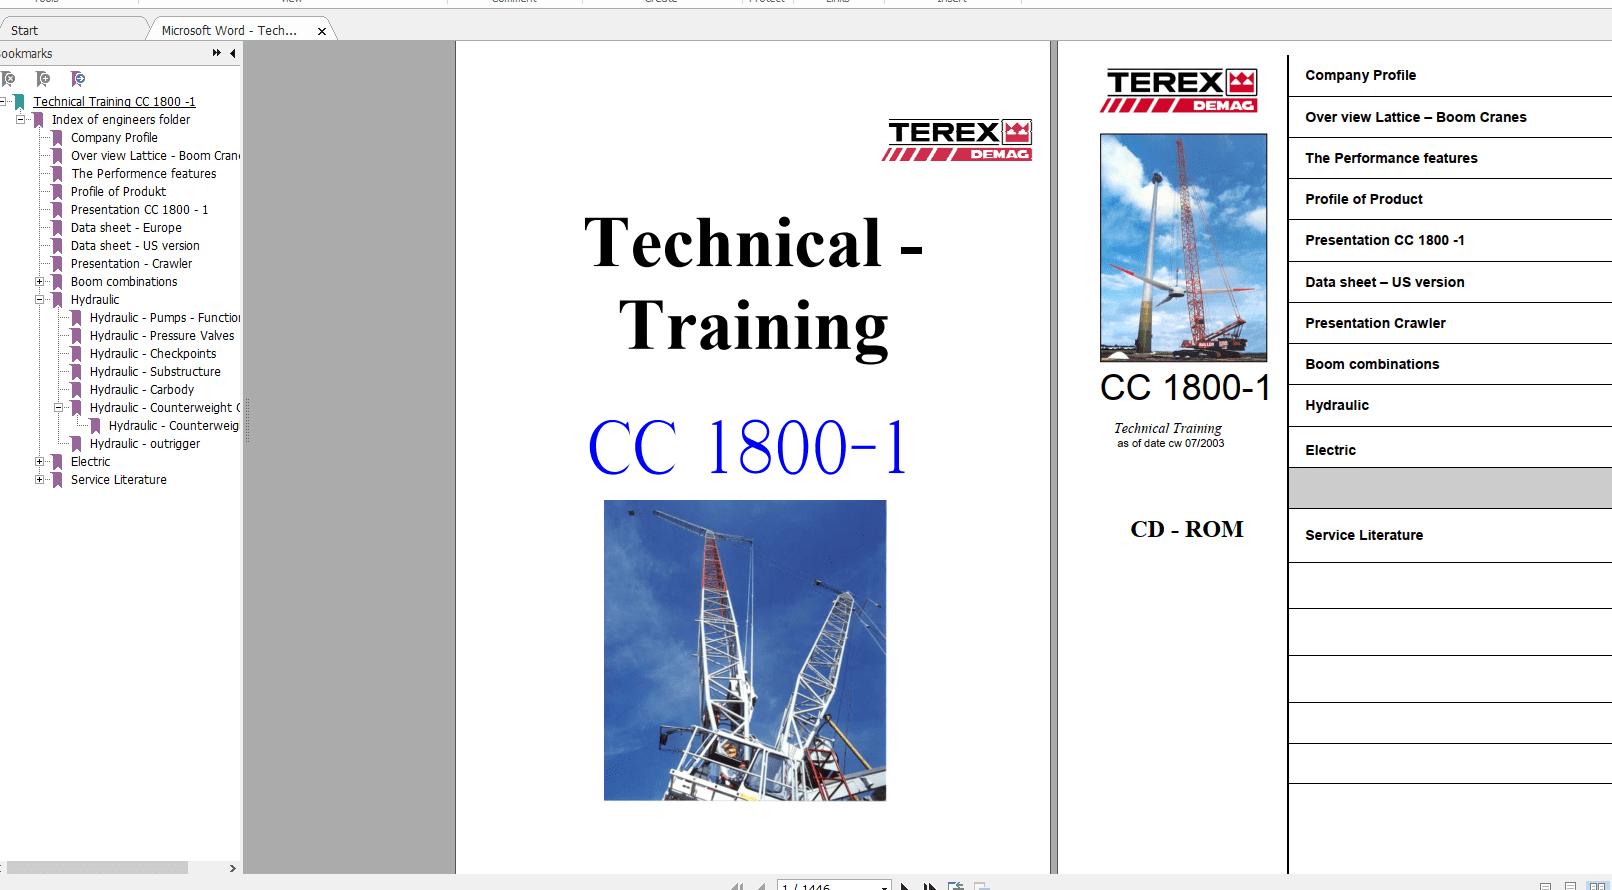 Terex_Demag_CC_1800-1_Crawler_Crane_Technical_Manual_1